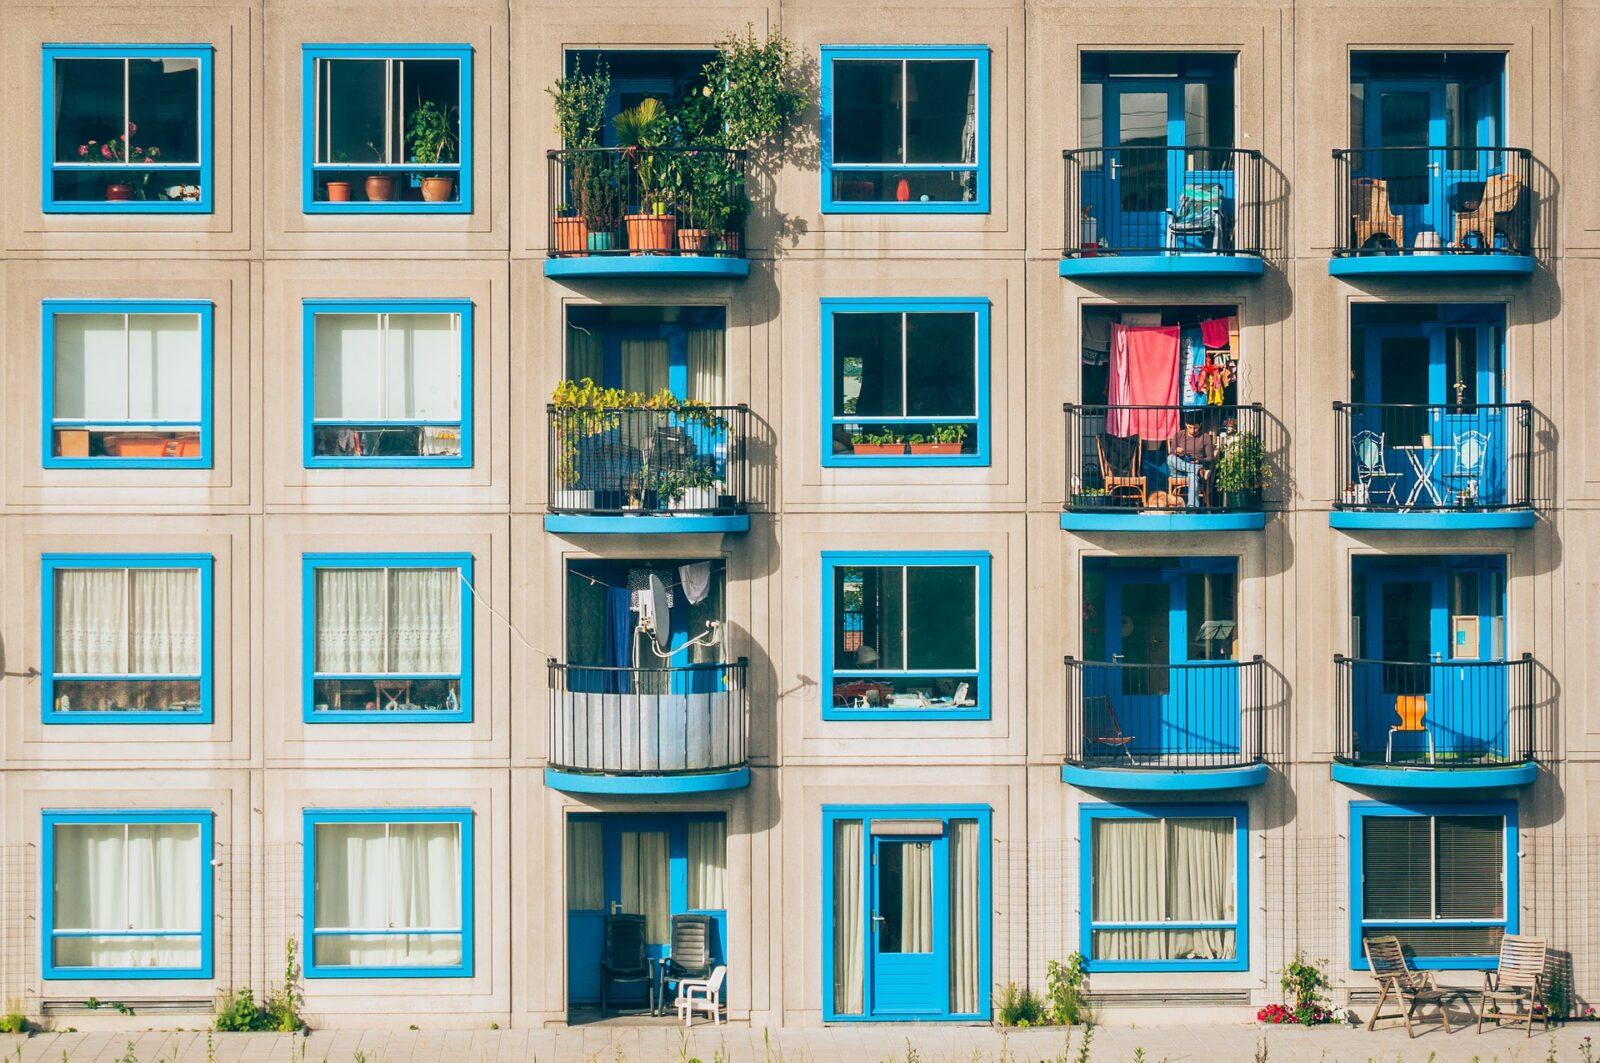 apartments 1845884 1920 3